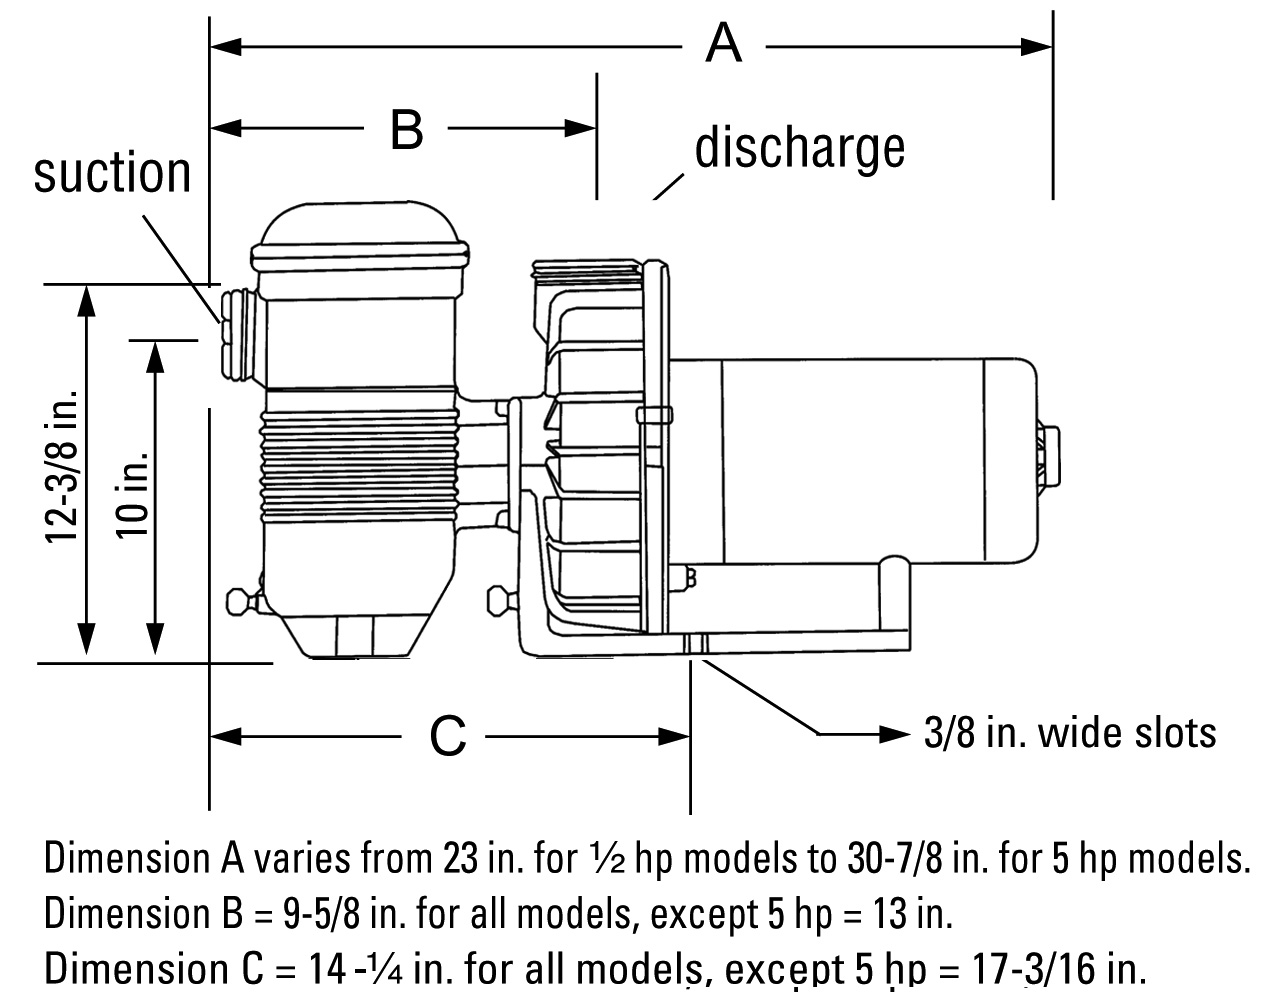 pool pump setup diagram rj11 to rj45 wiring pentair challenger high flo pumps marin service